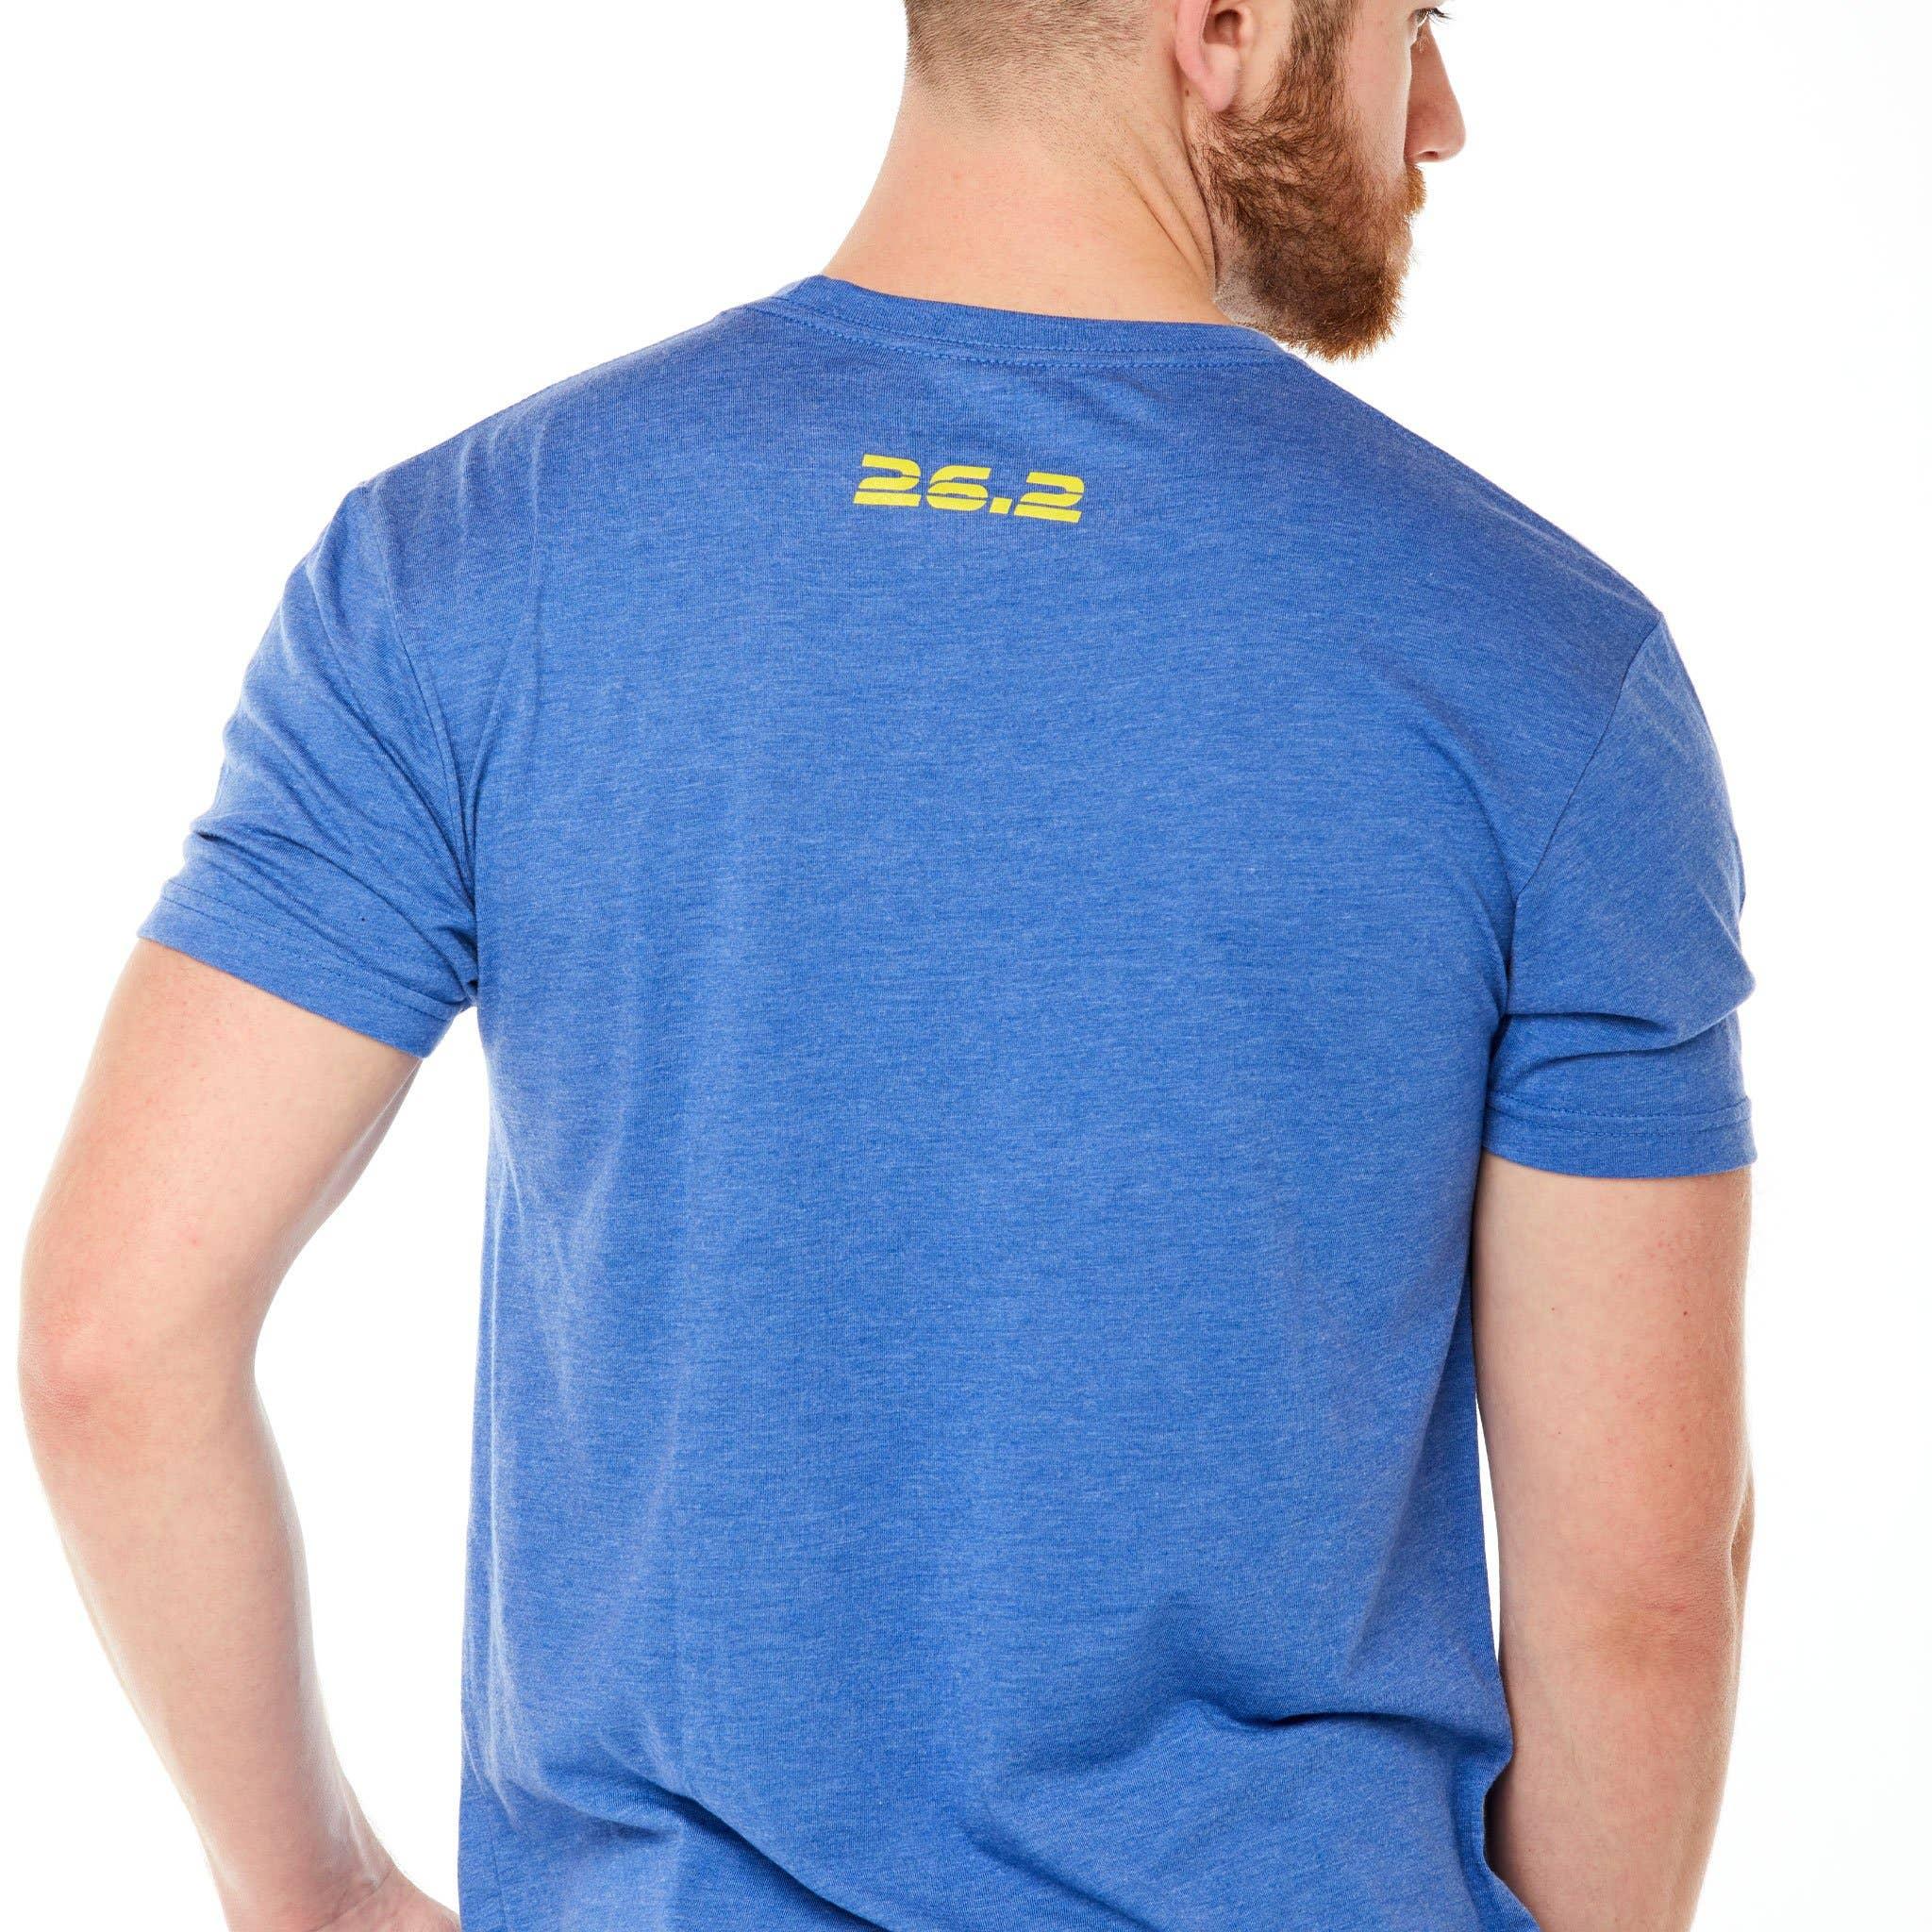 TB12™ Boston 2020 T-shirt